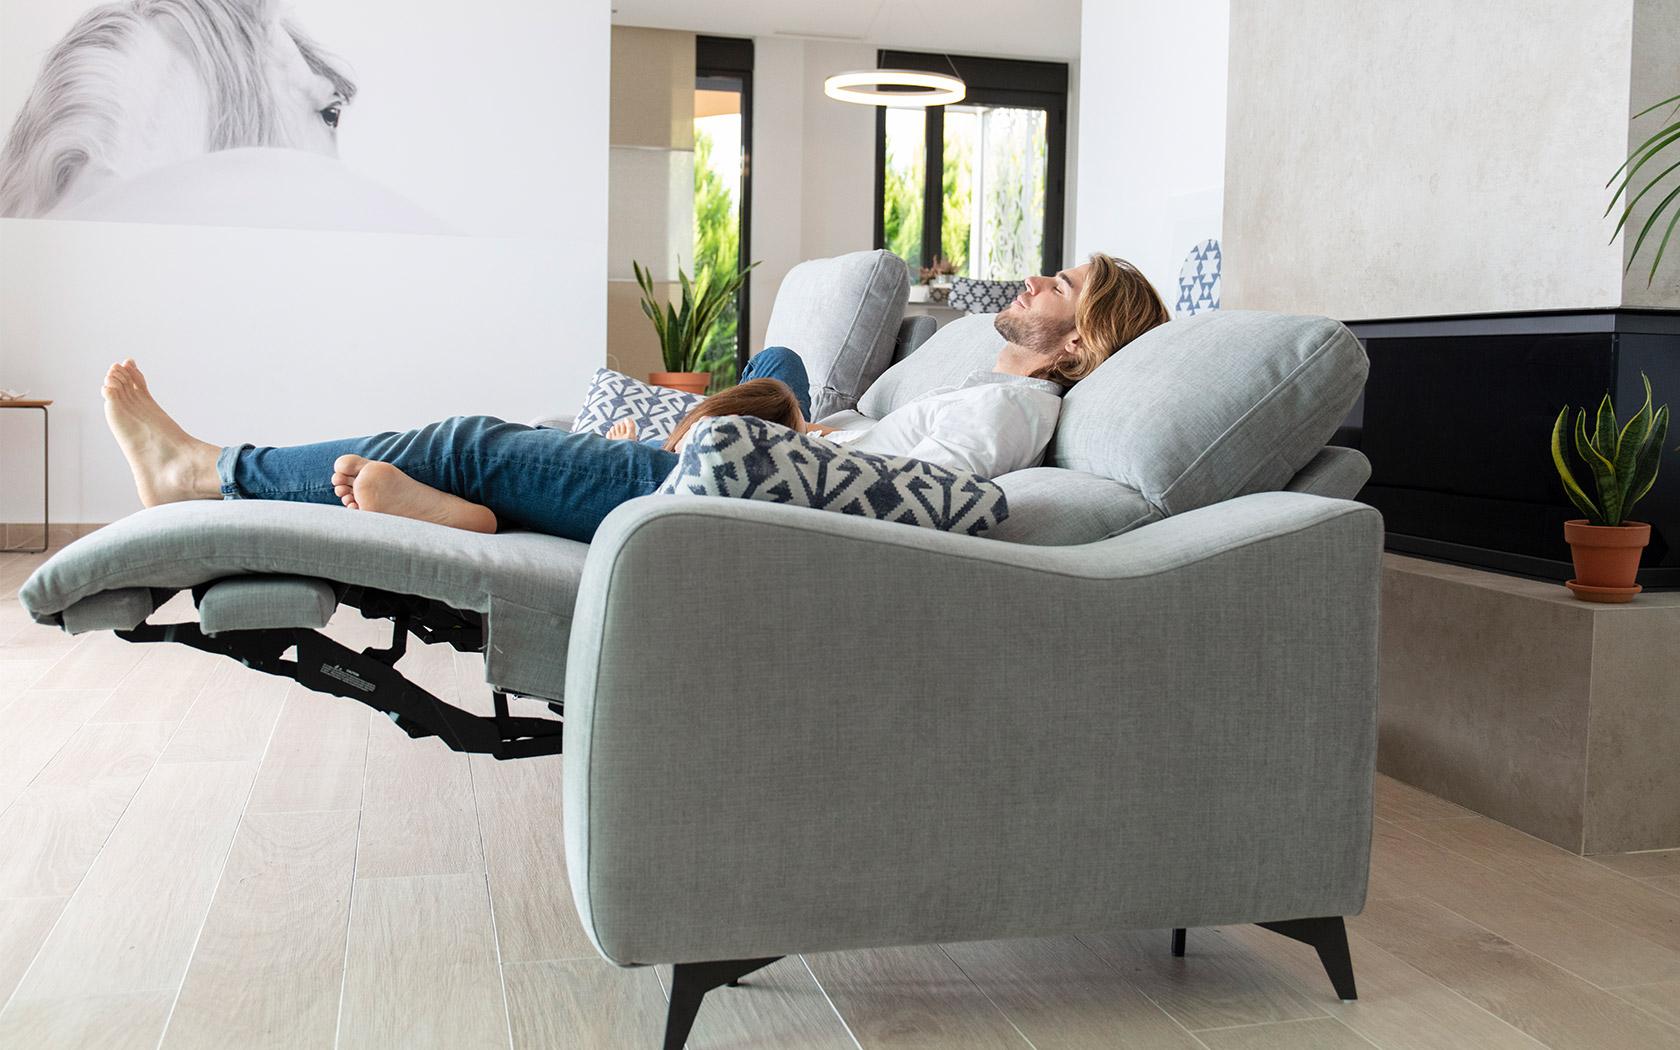 axel sofa 2021 08